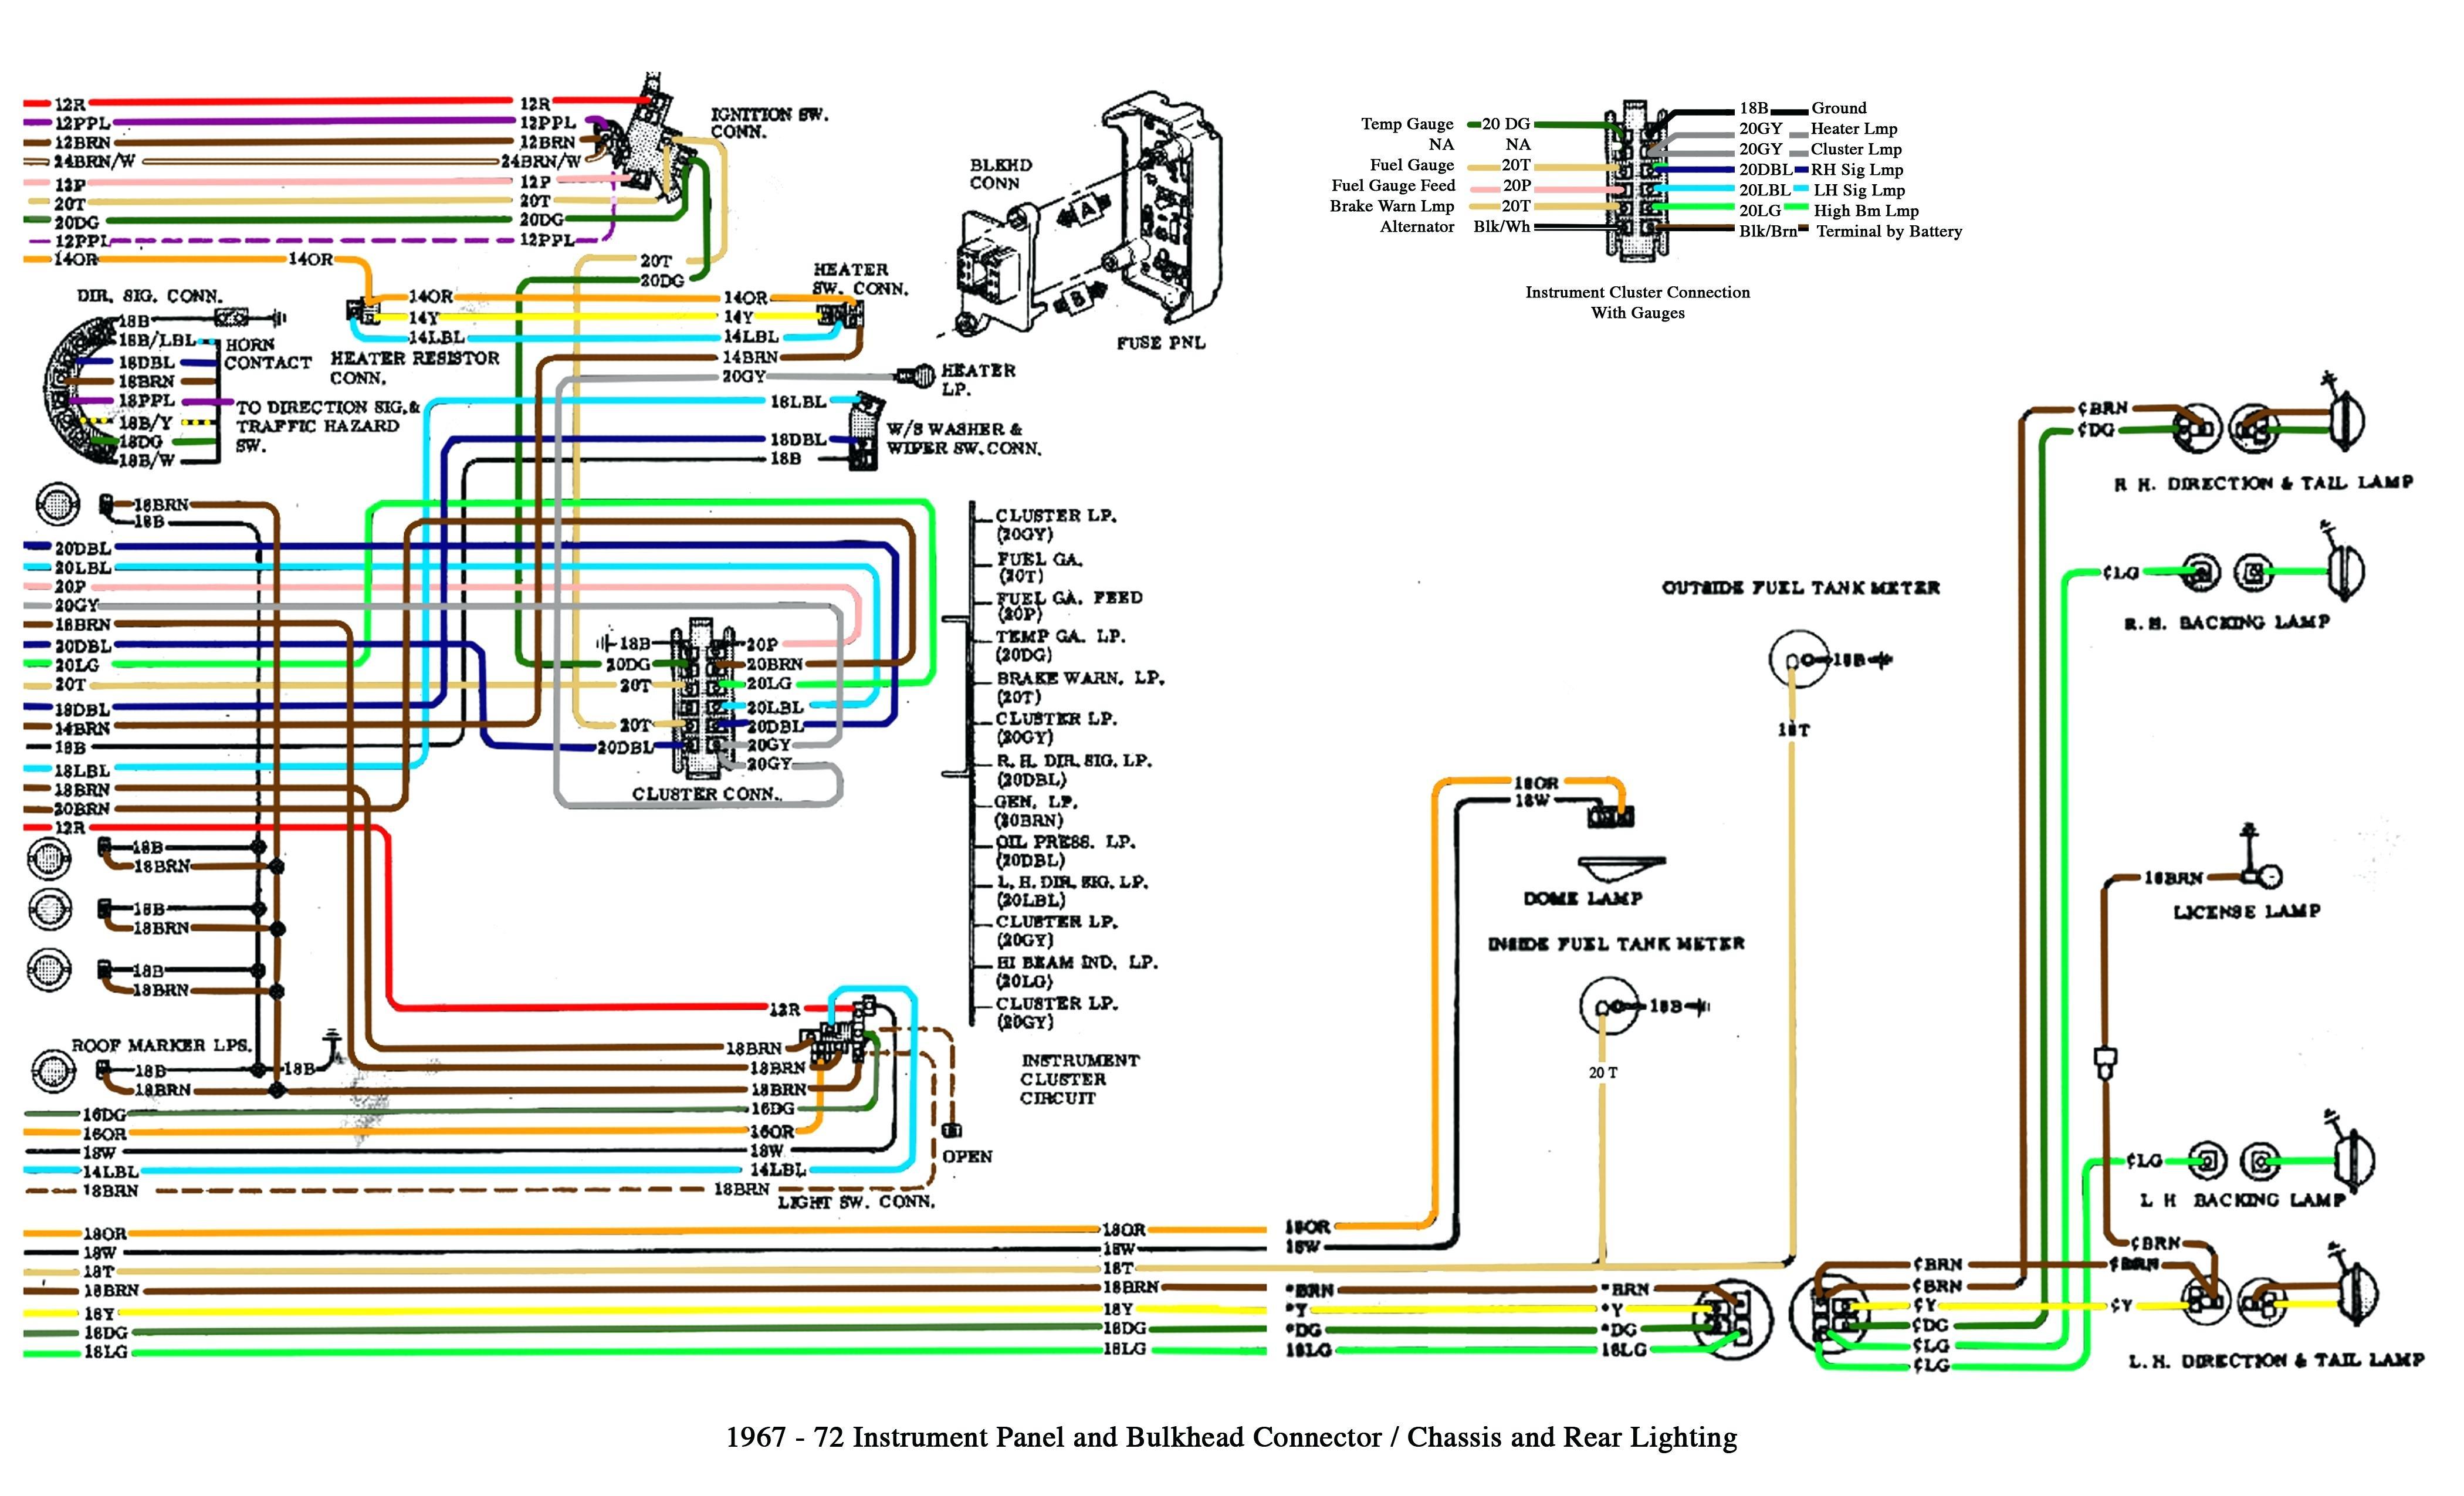 Geo Tracker Trailer Wiring Harness - Wiring Diagrams Hubs - Chevy Silverado Wiring Harness Diagram